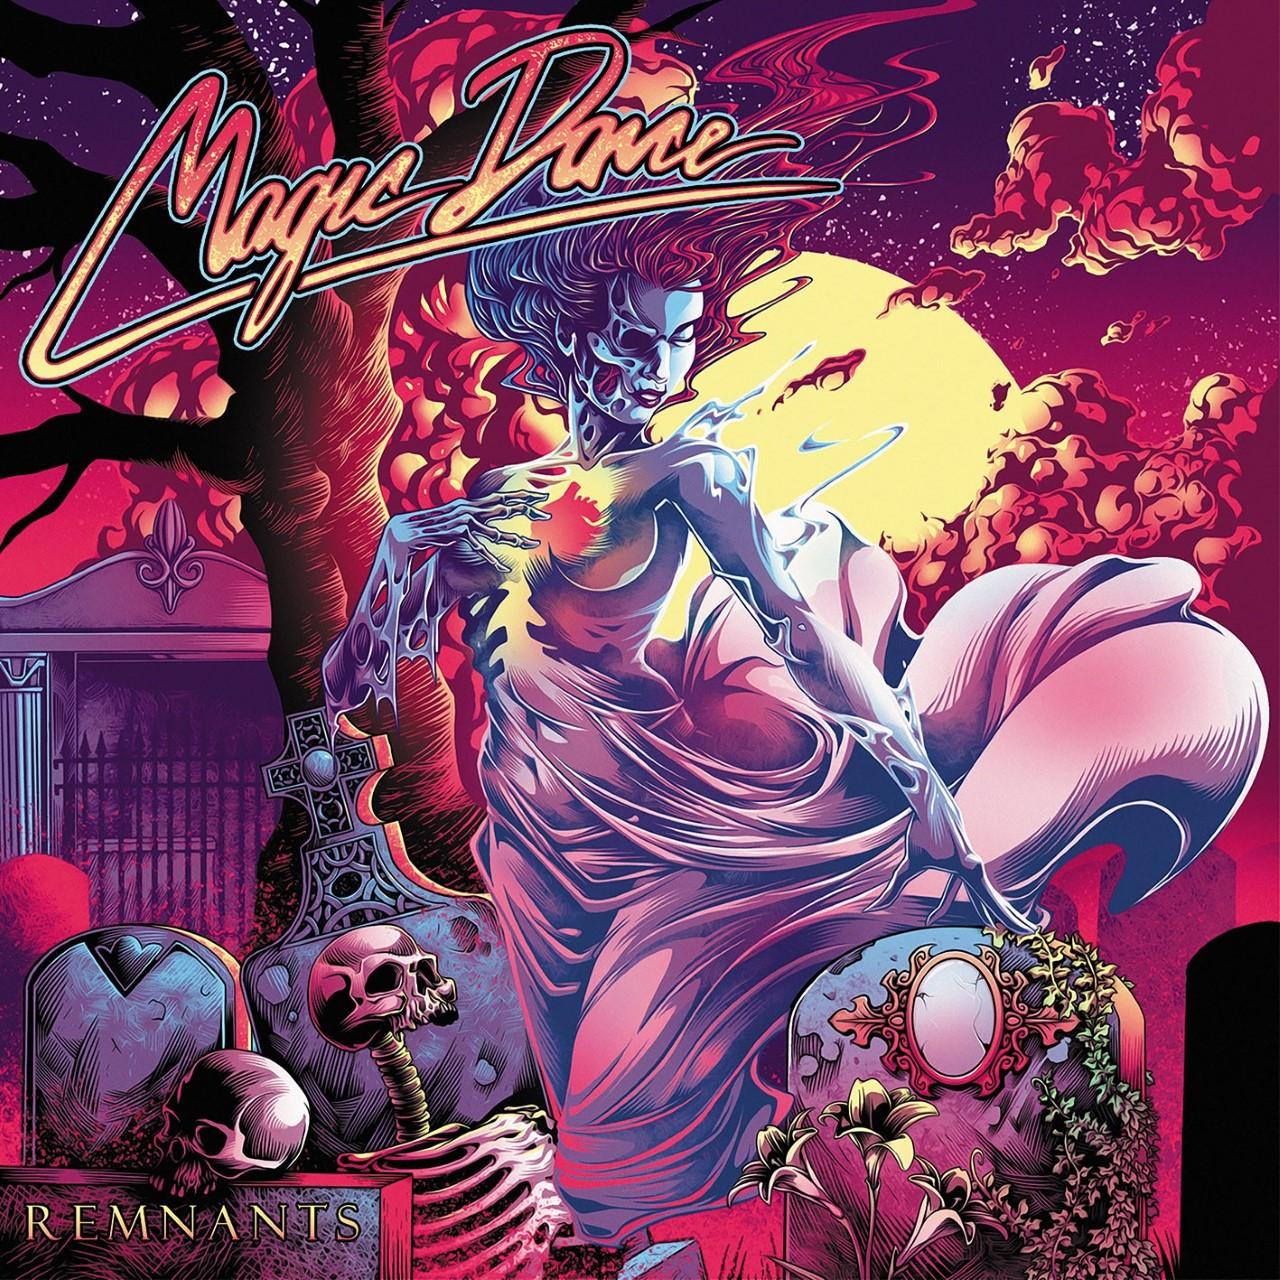 magic dance 20 CD